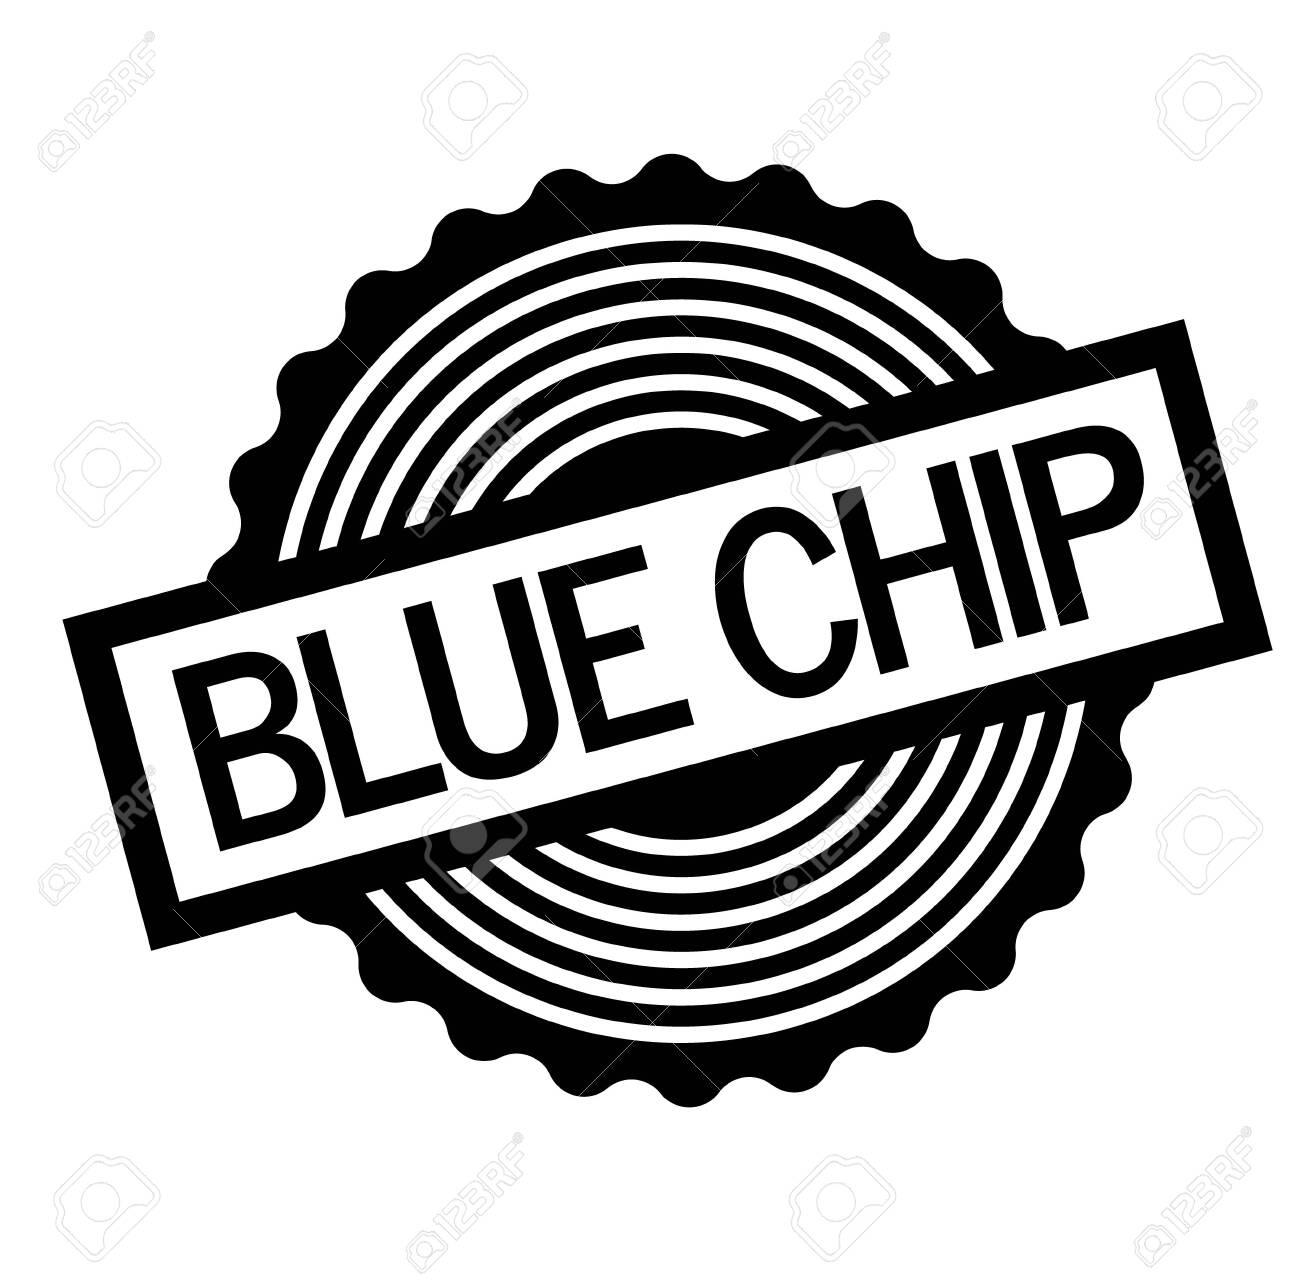 Blue chip black stamp on white background. Flat illustration - 124418004